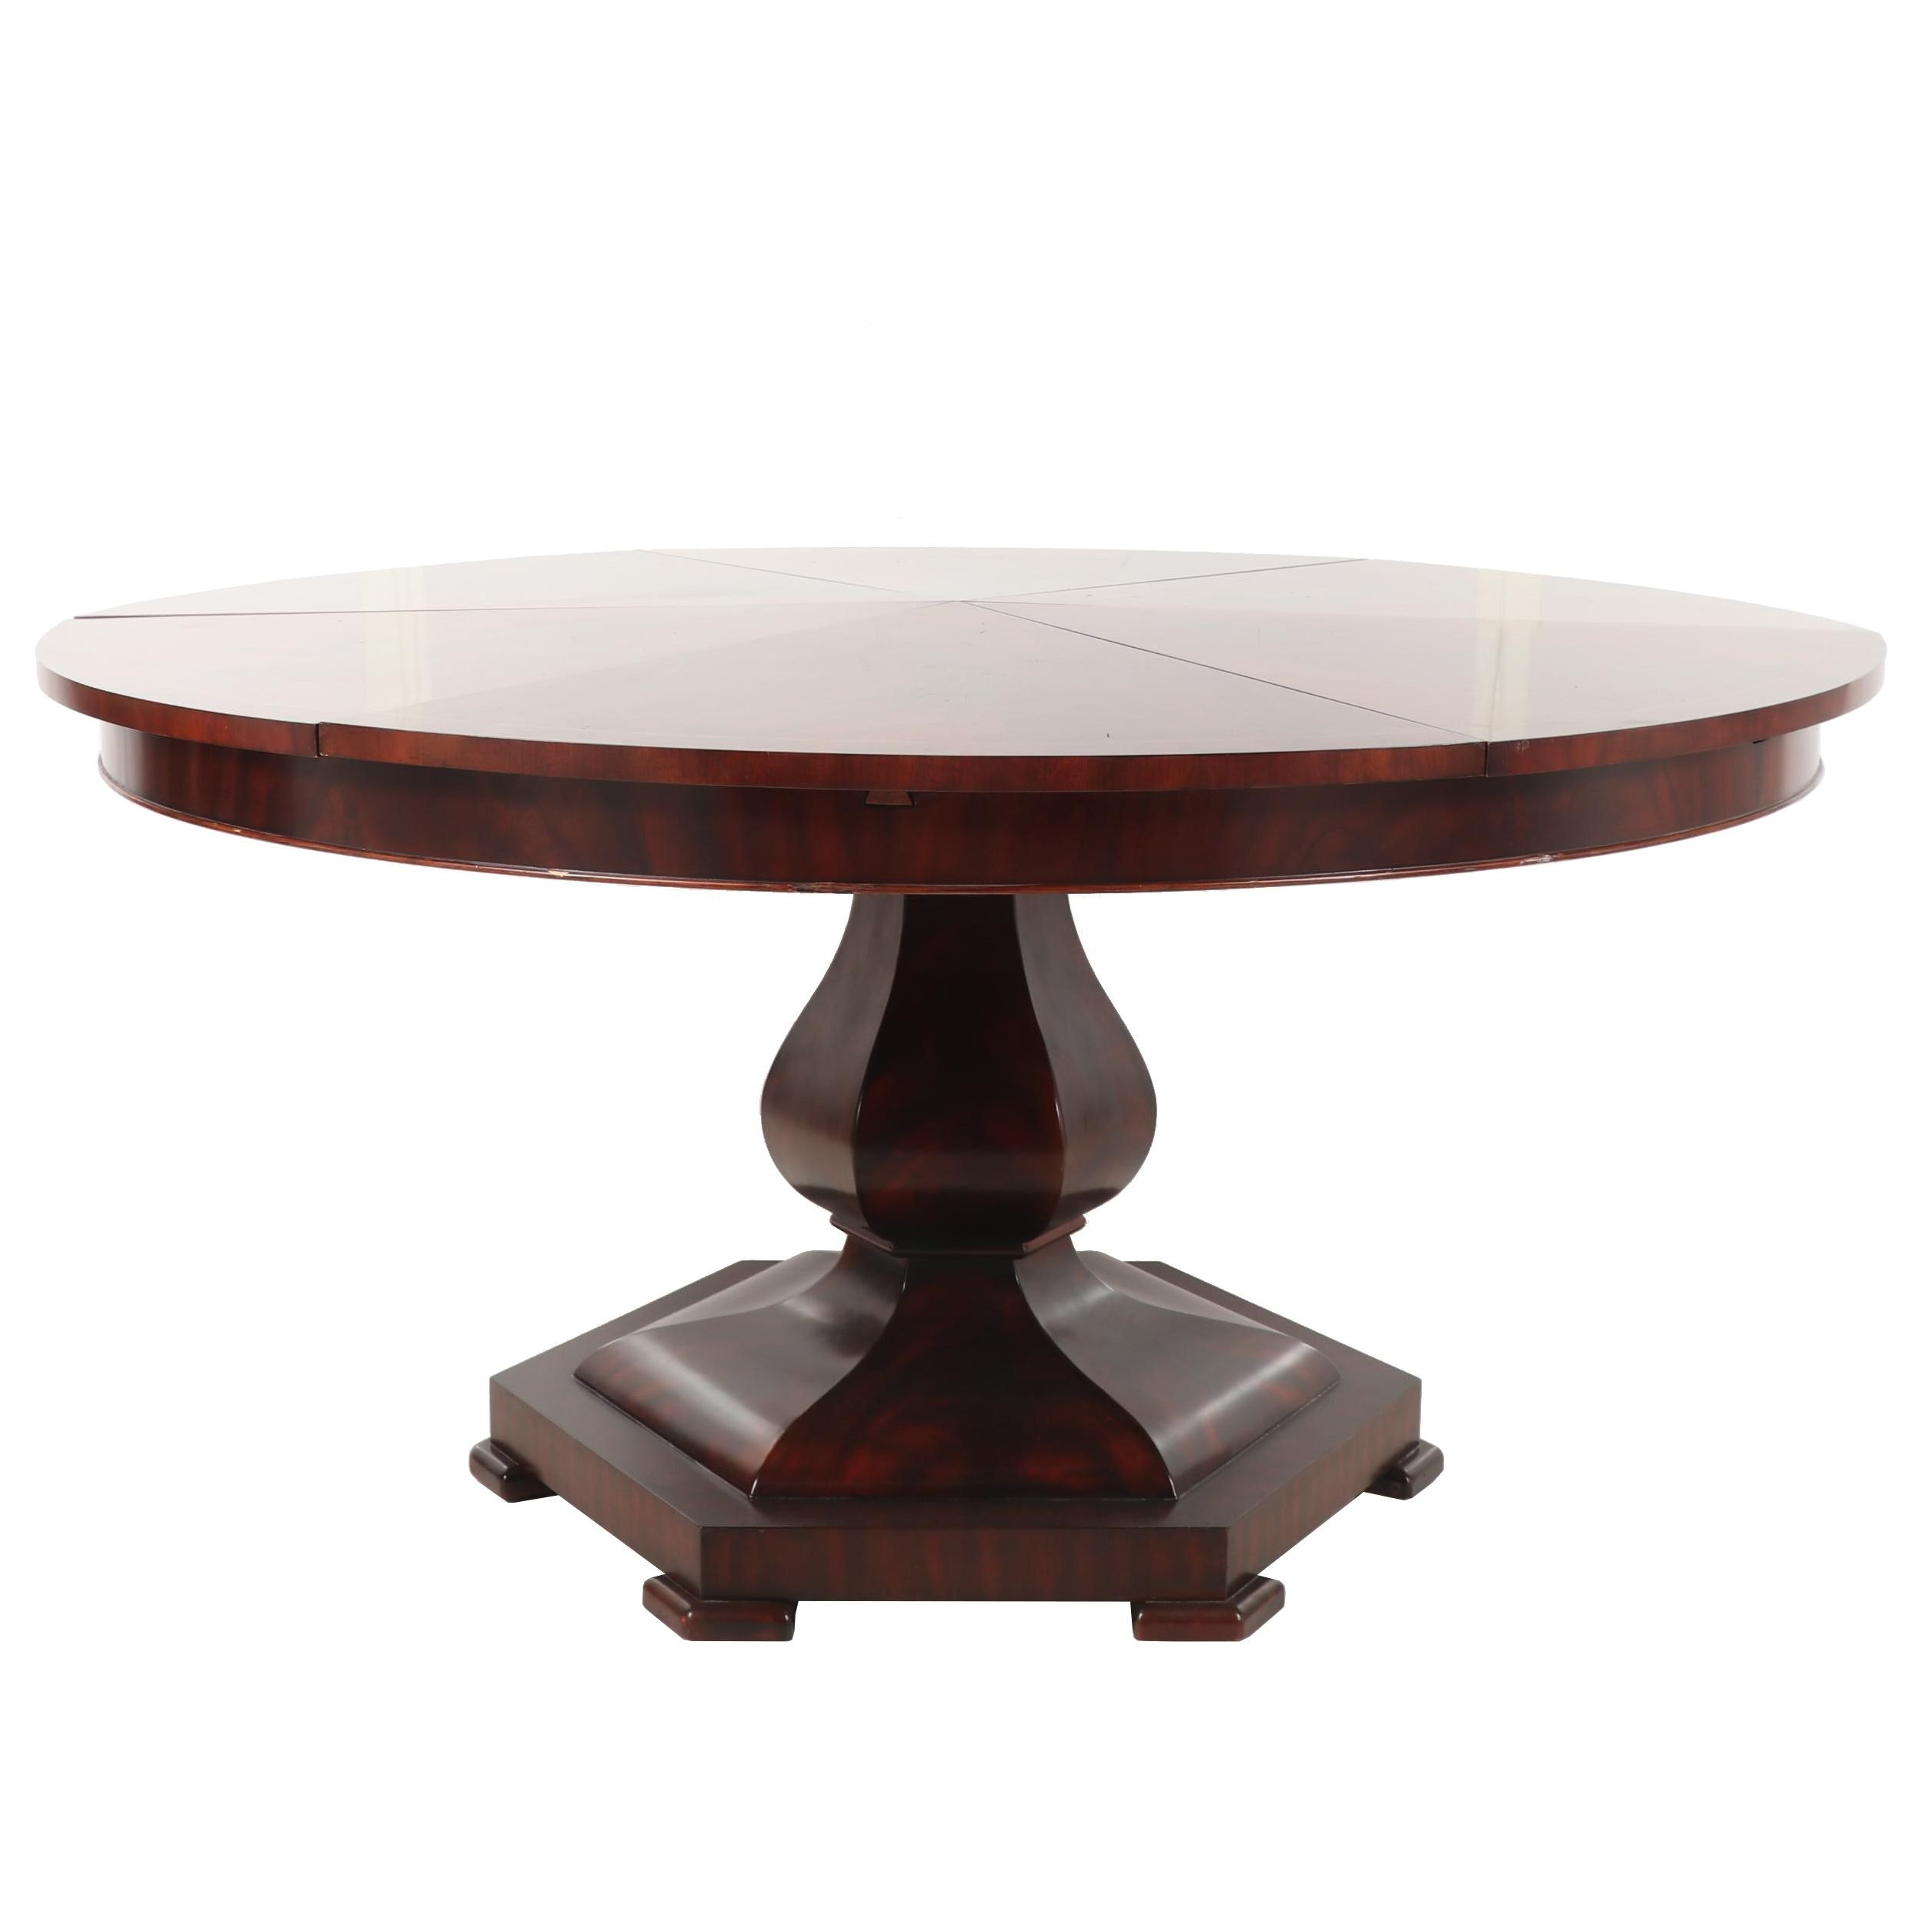 Drexel-Heritage Cherry Wood Pedestal Dining Table